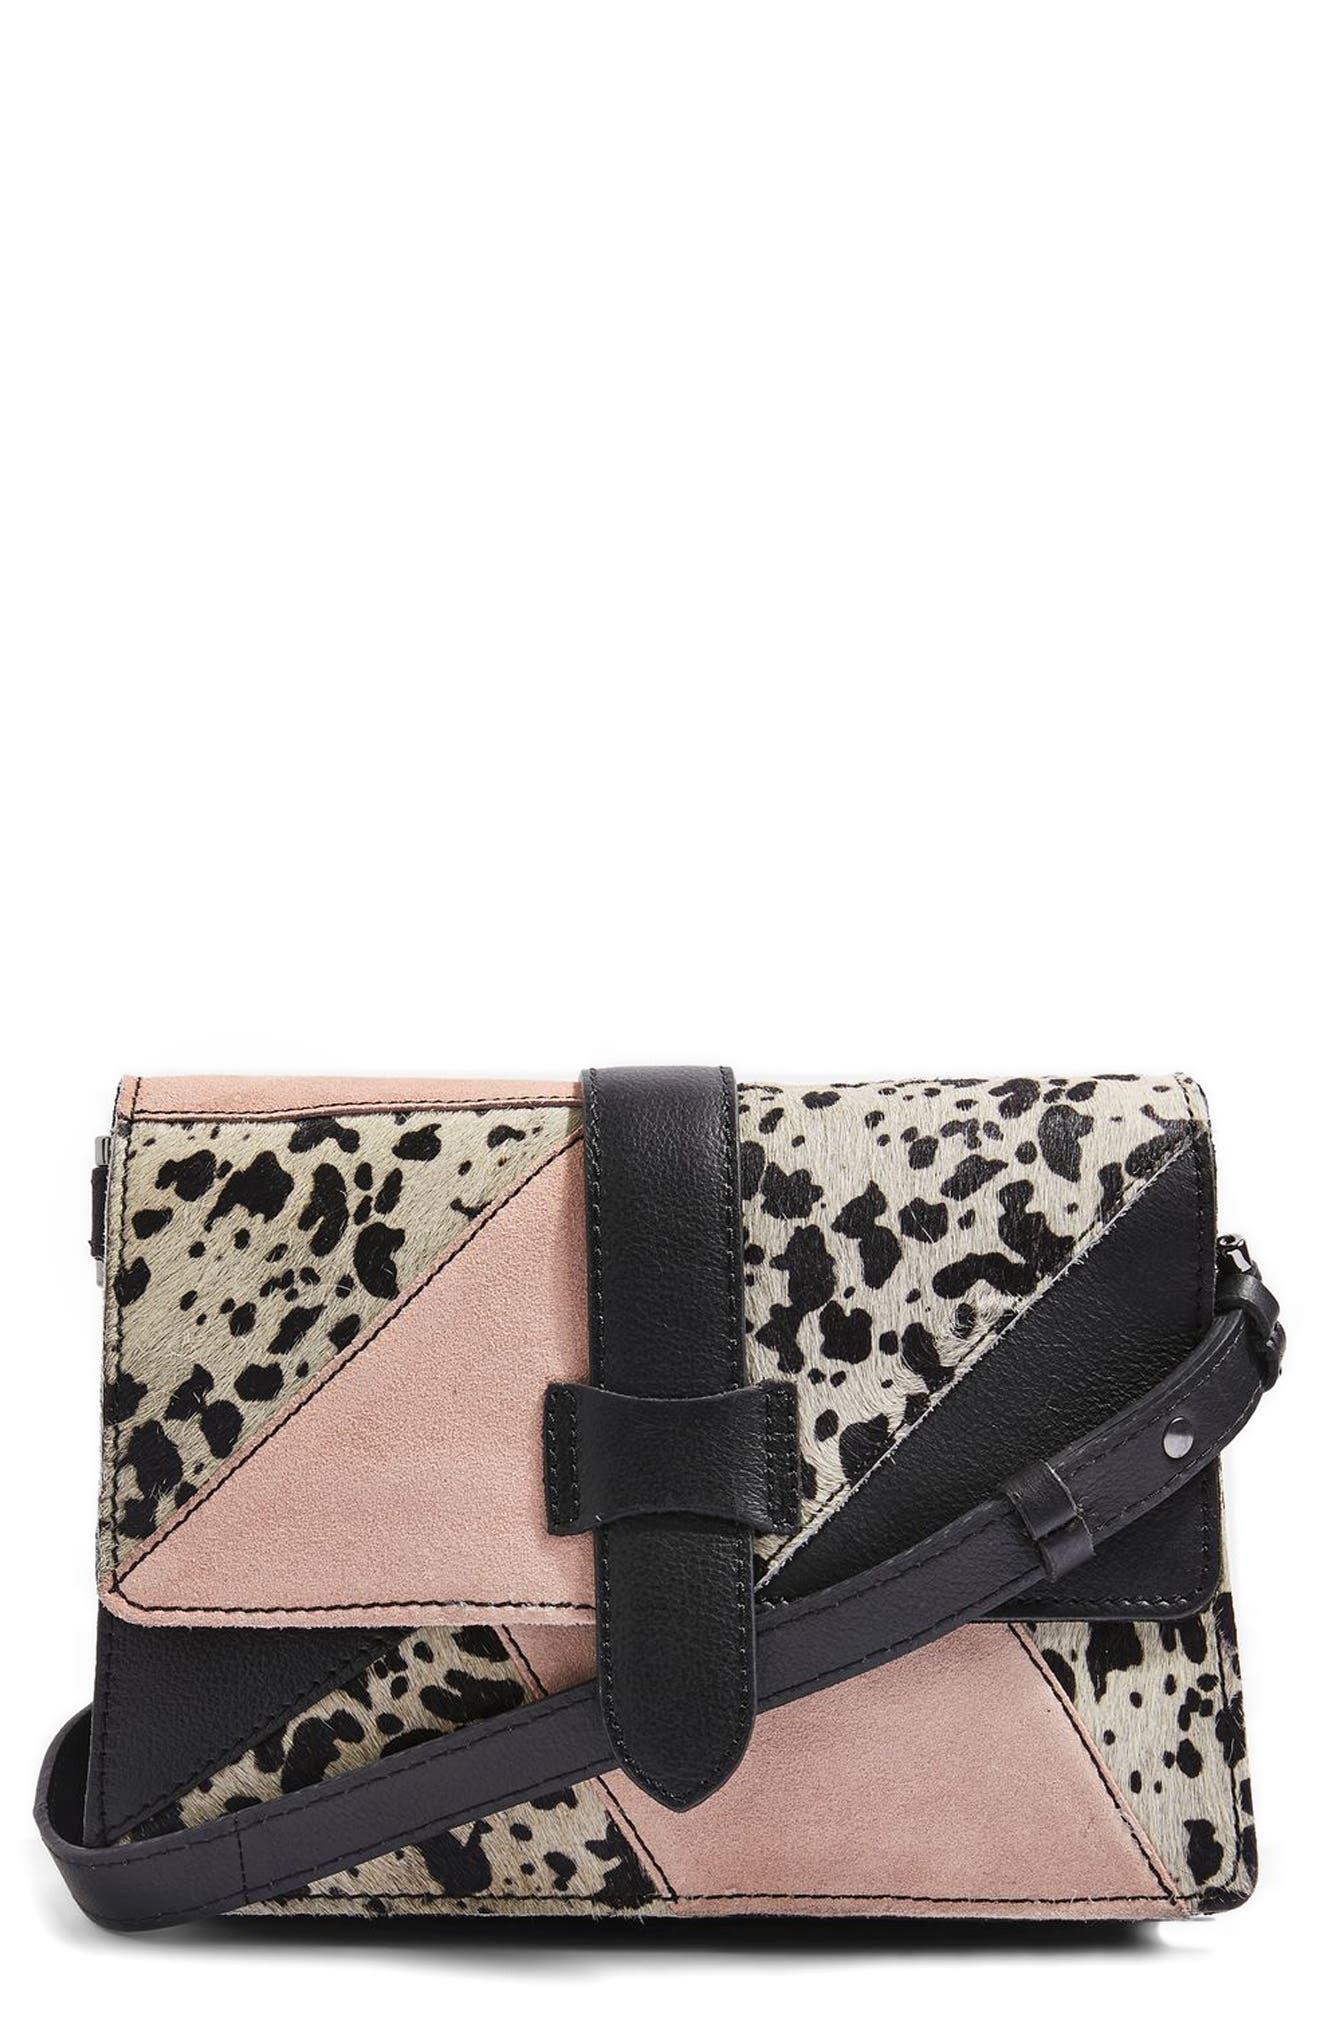 Premium Leather & Genuine Calf Hair Patchwork Crossbody Bag,                             Main thumbnail 1, color,                             Black Multi